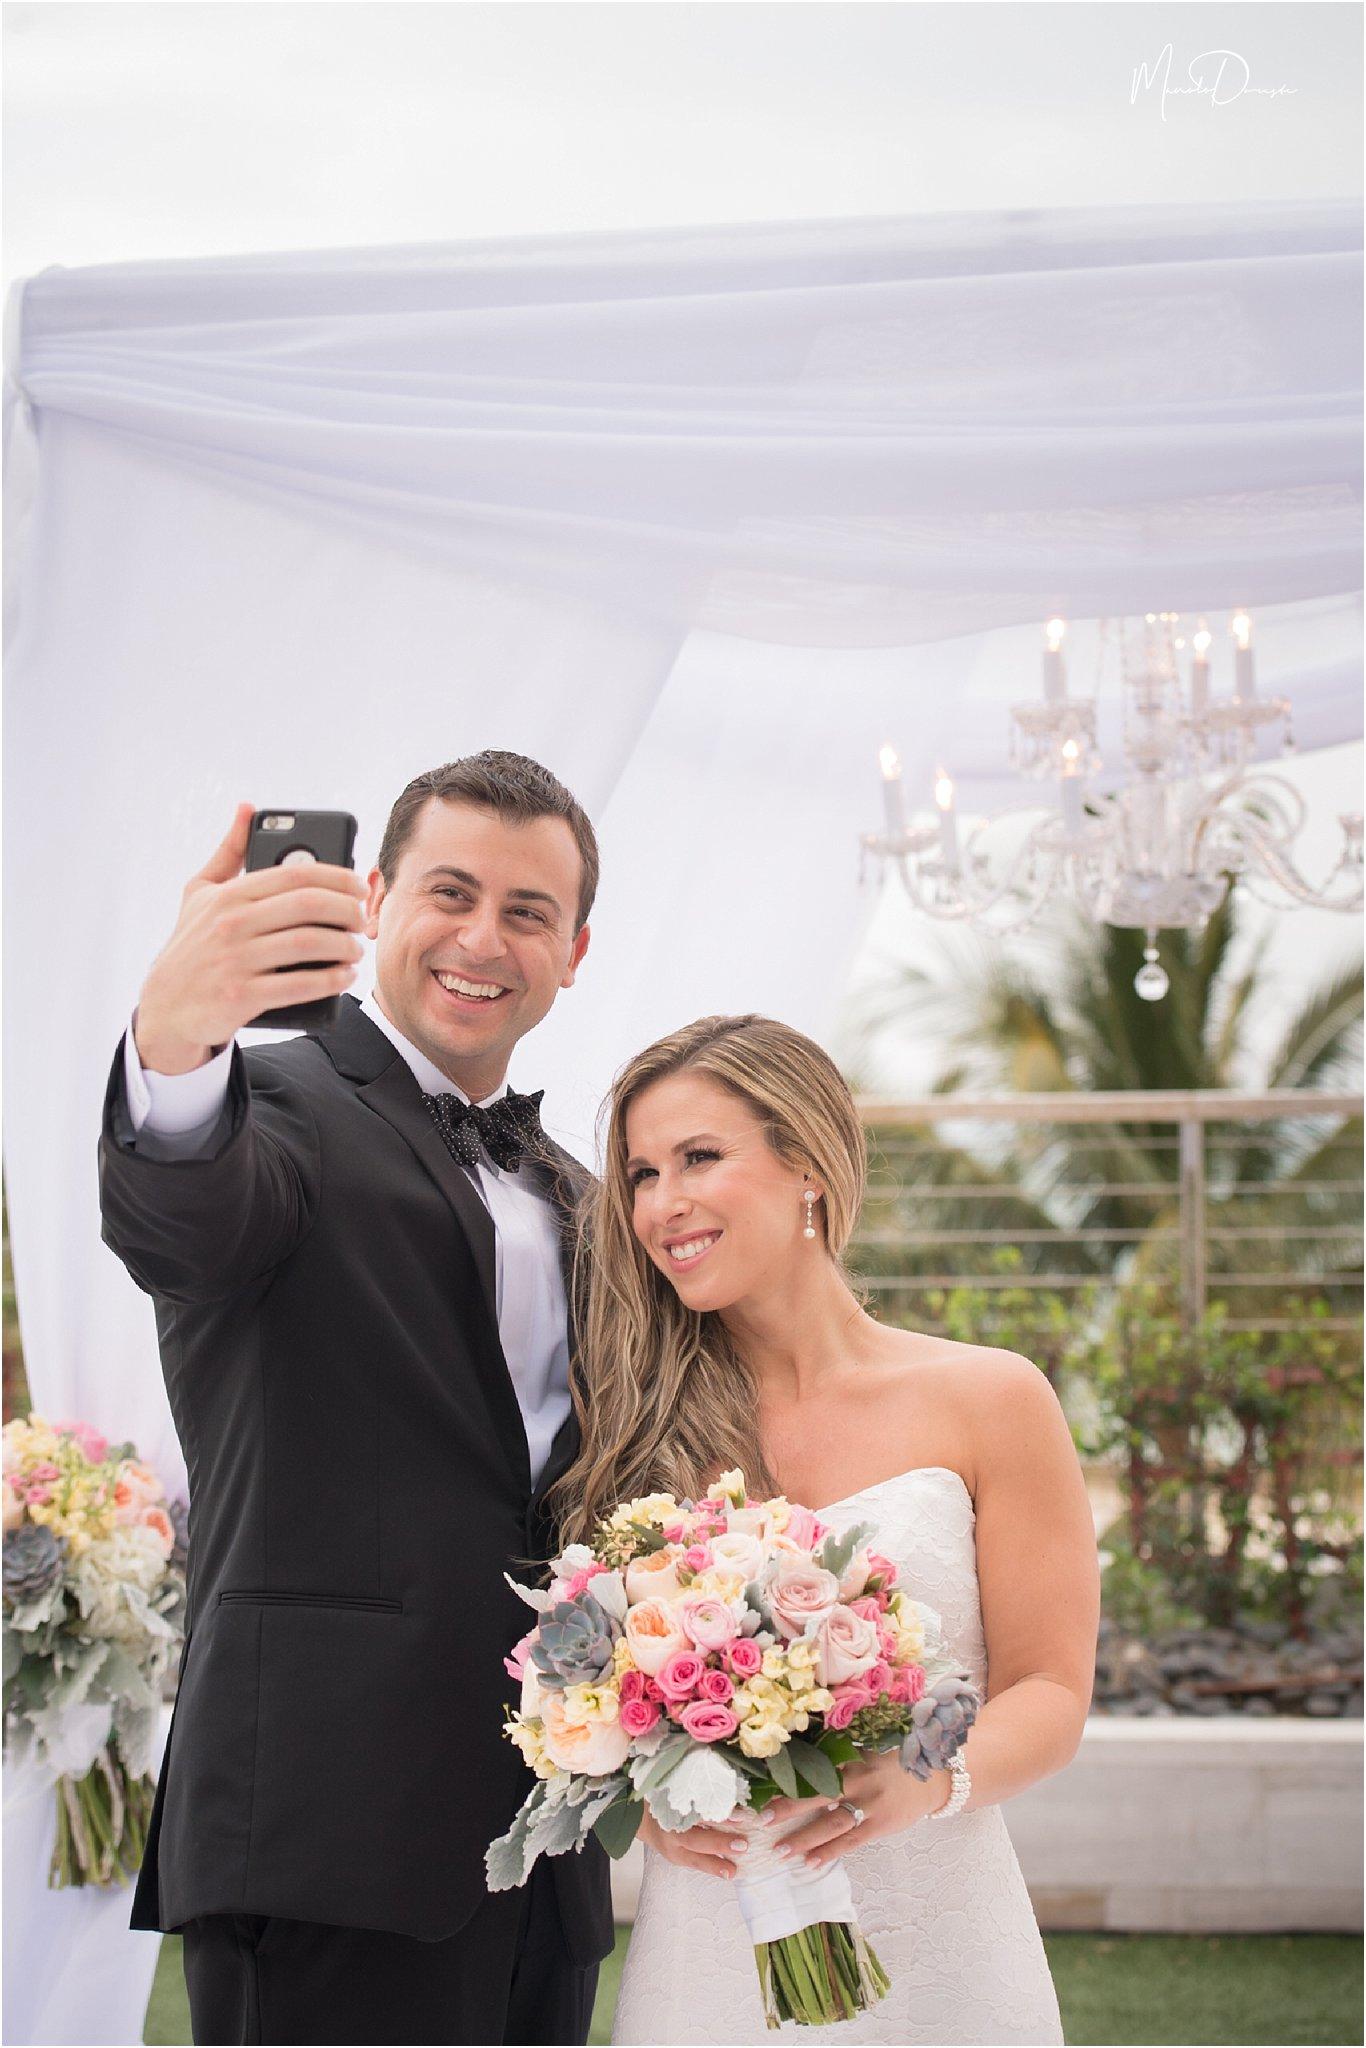 0674_ManoloDoreste_InFocusStudios_Wedding_Family_Photography_Miami_MiamiPhotographer.jpg